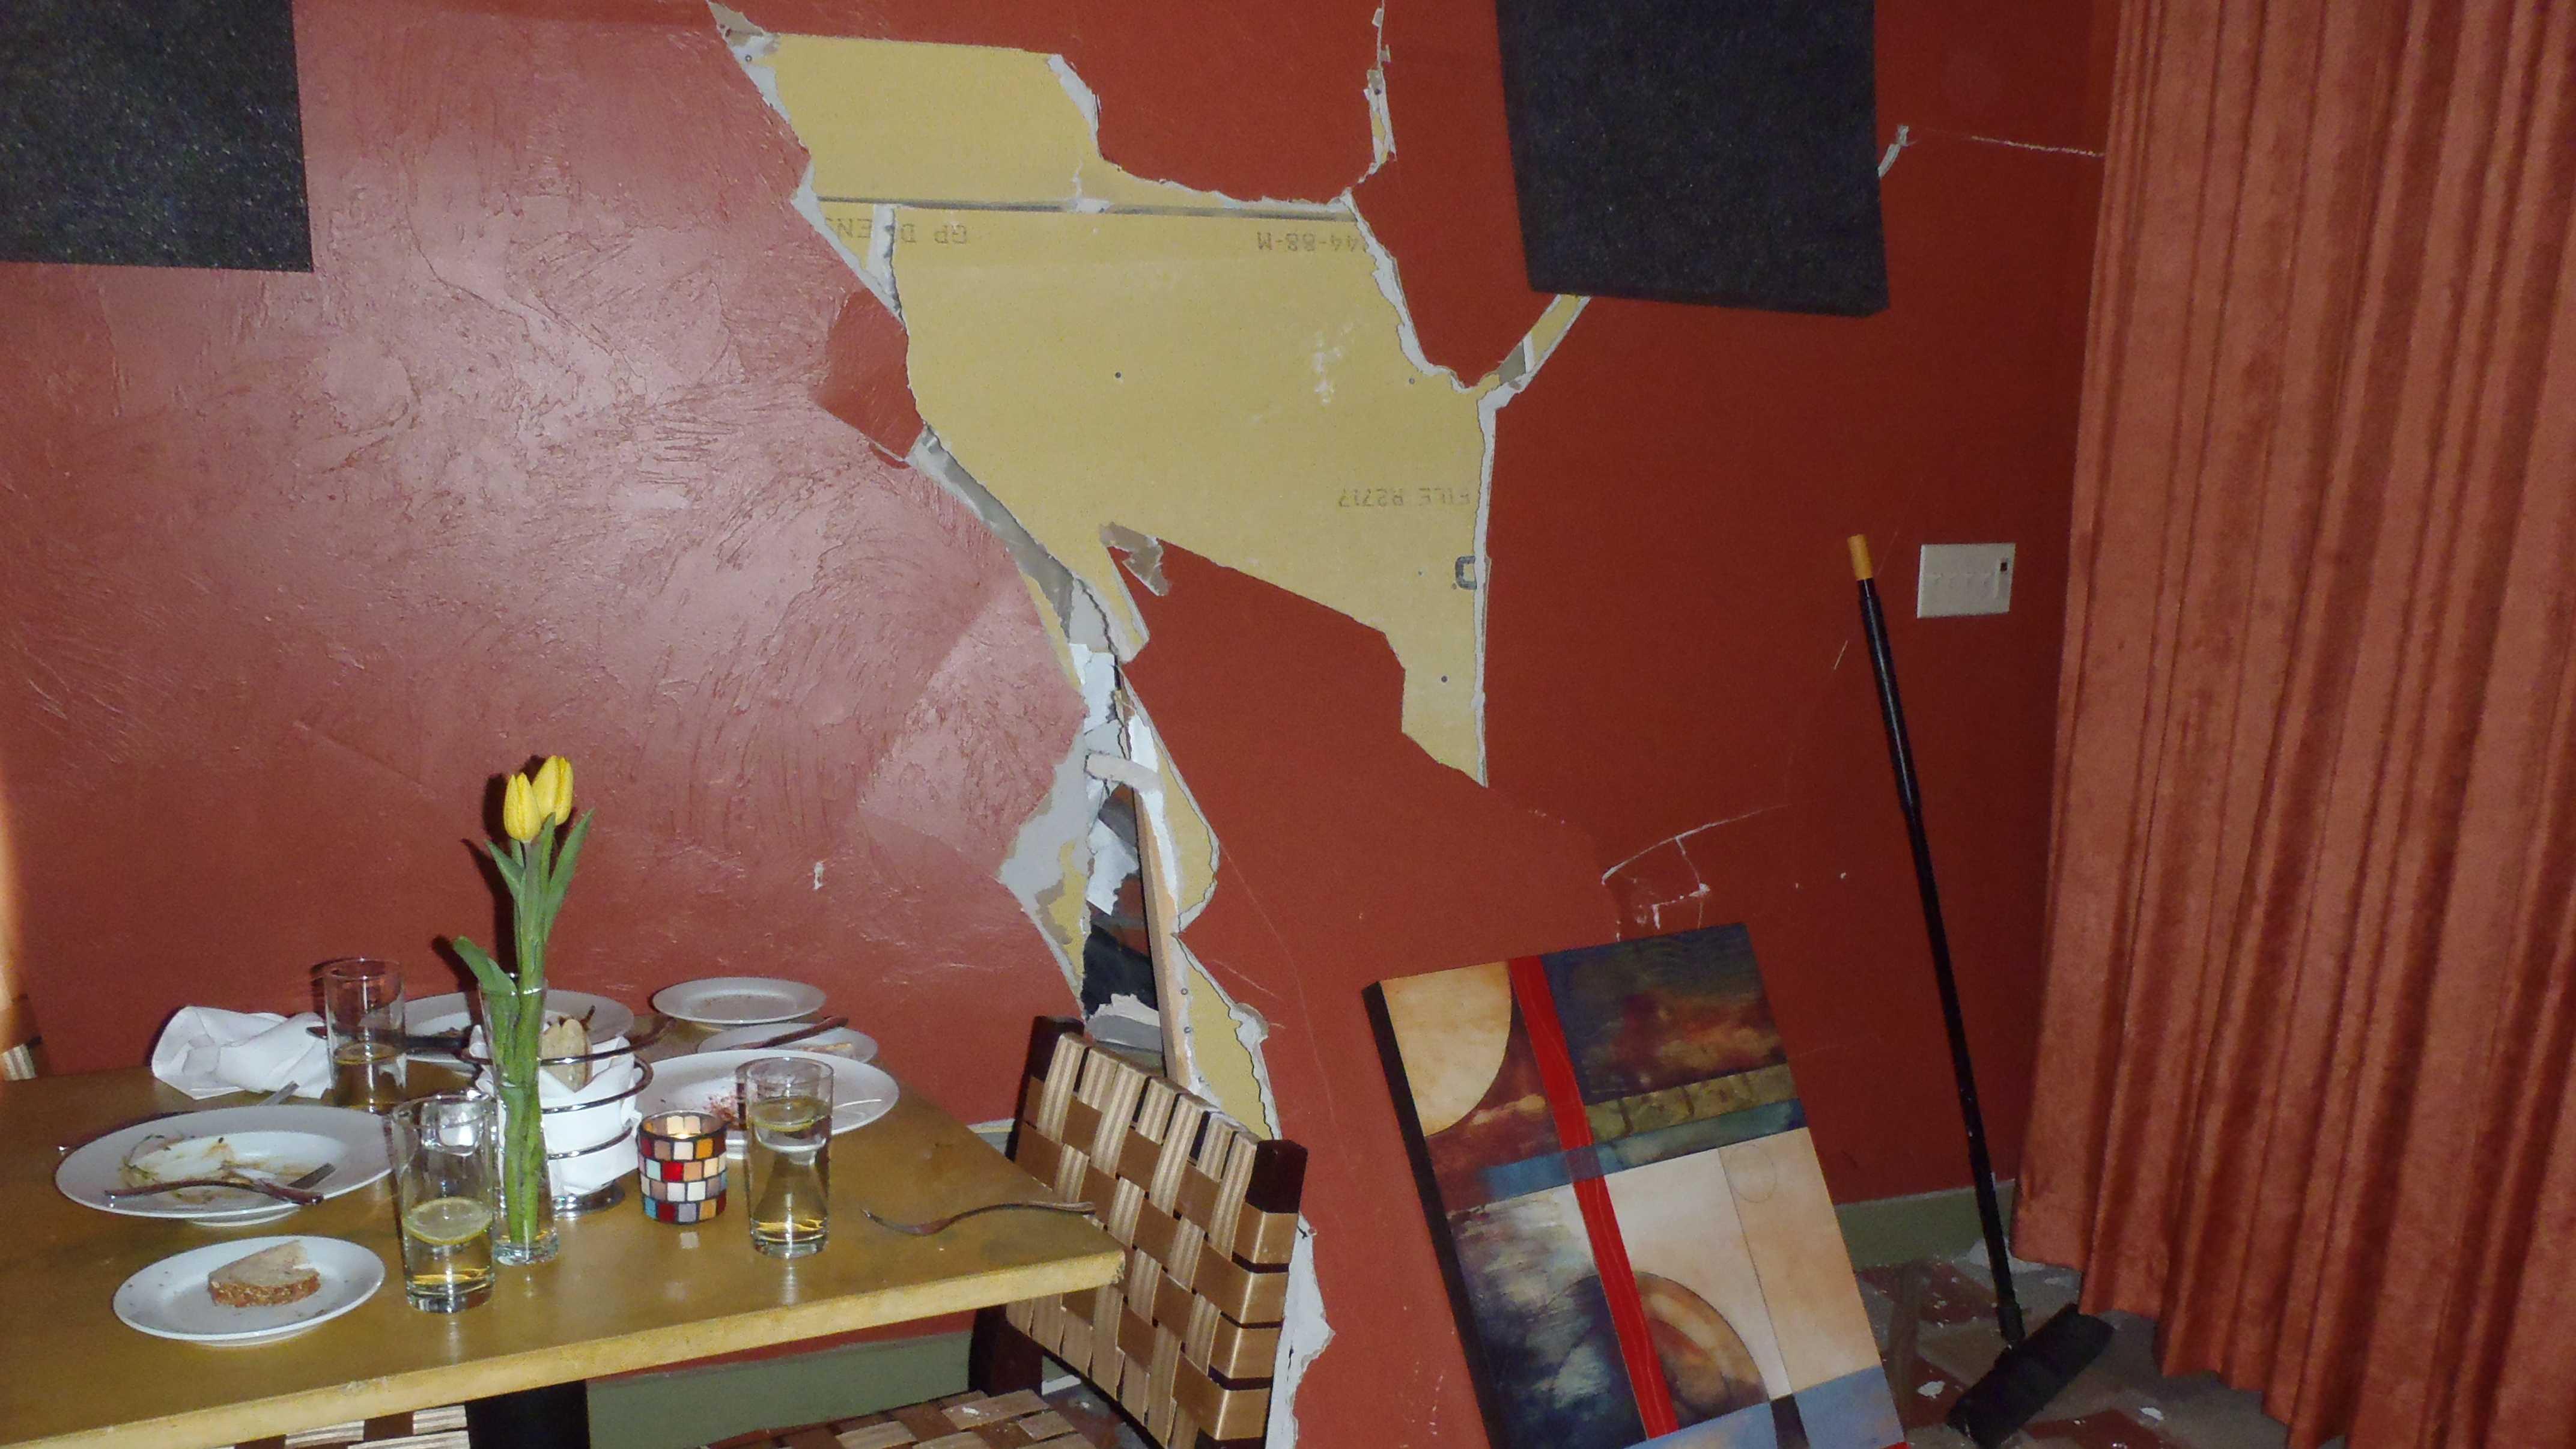 arlington restaurant crash 2 030214.jpg